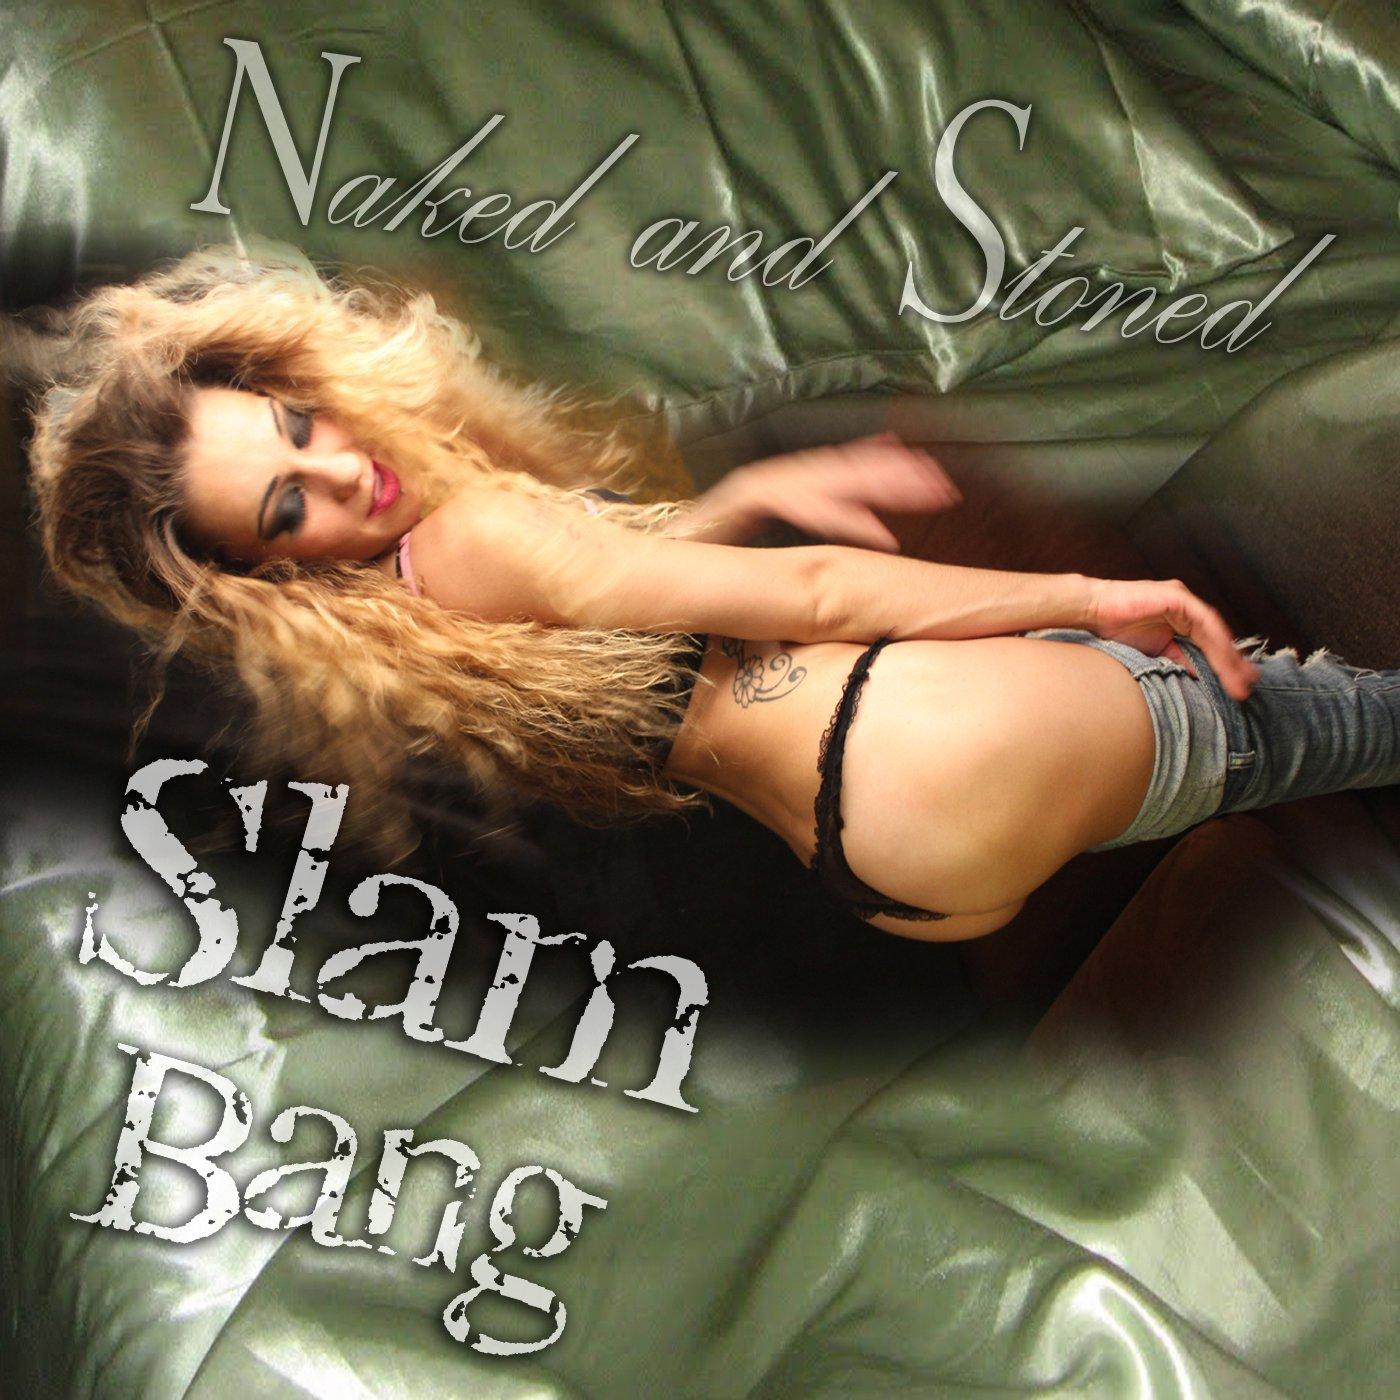 Naked and Stoned by Slam Bang USB Wristband